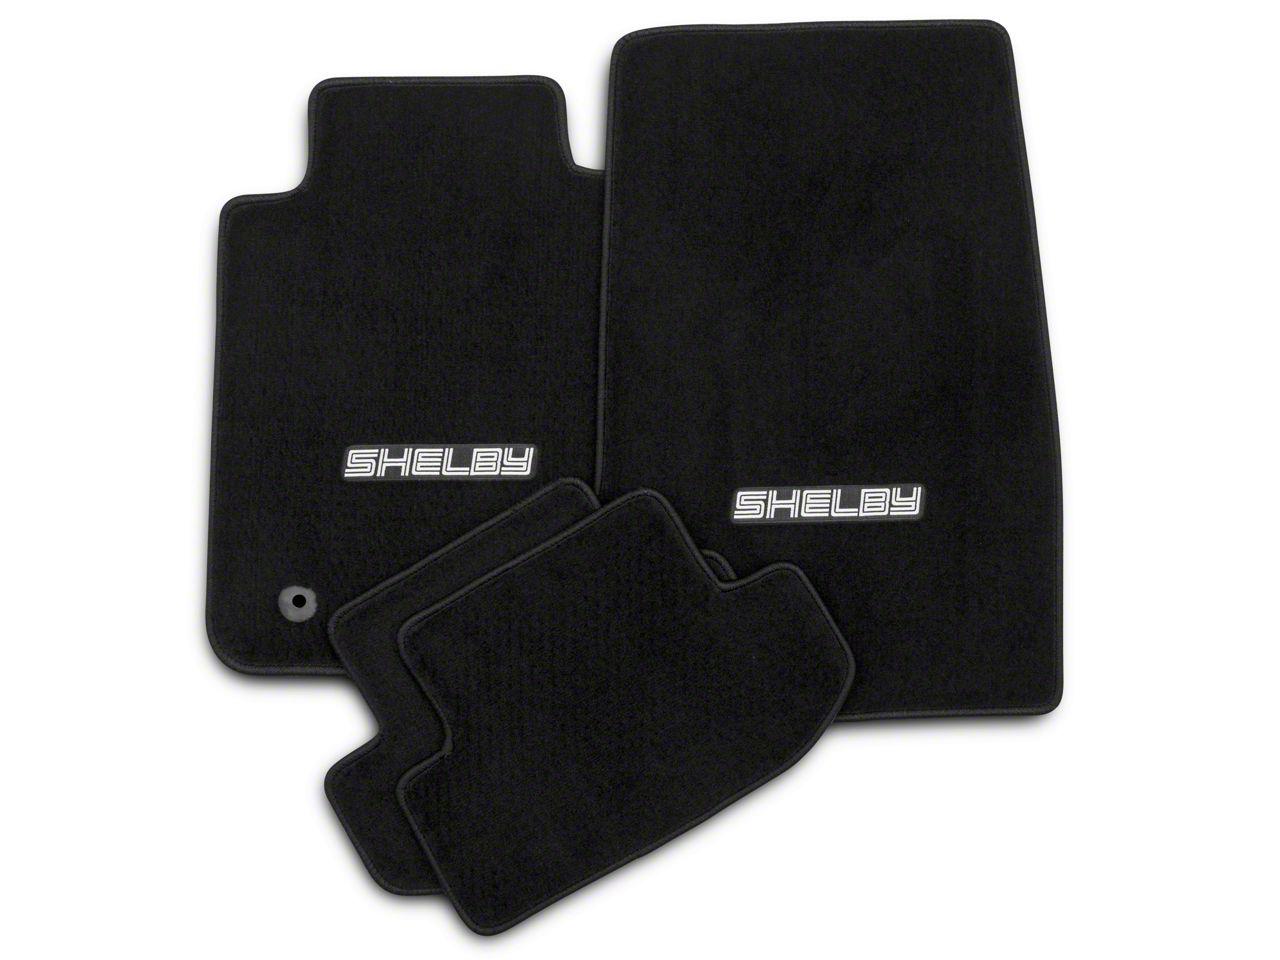 Lloyd Front & Rear Floor Mats w/ Shelby Logo - Black (15-19 All)